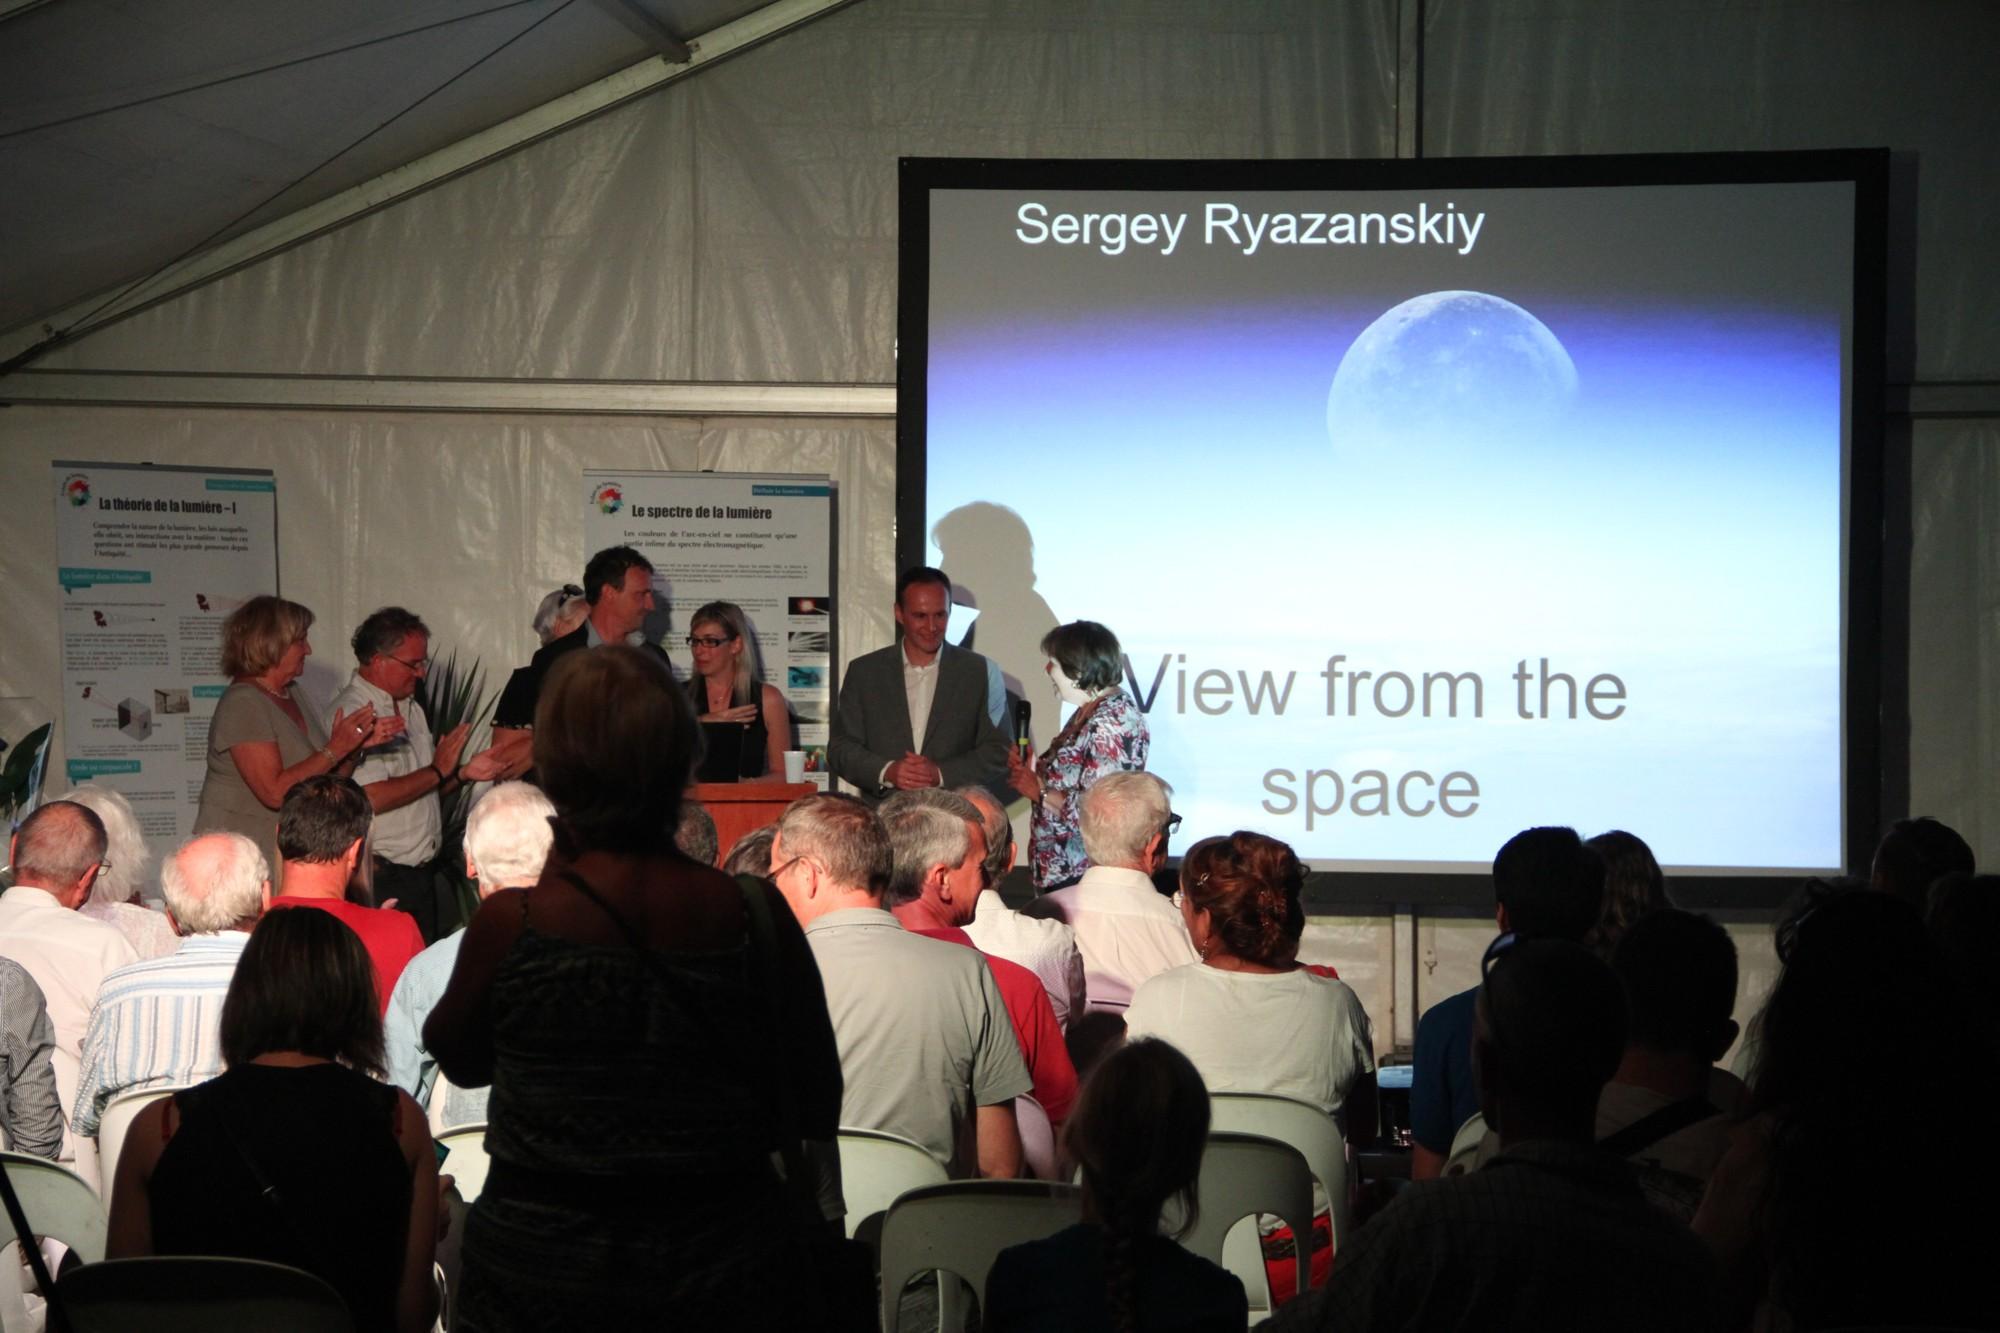 16-09-10-20h-36m-19s-conference-riazanskiy-r